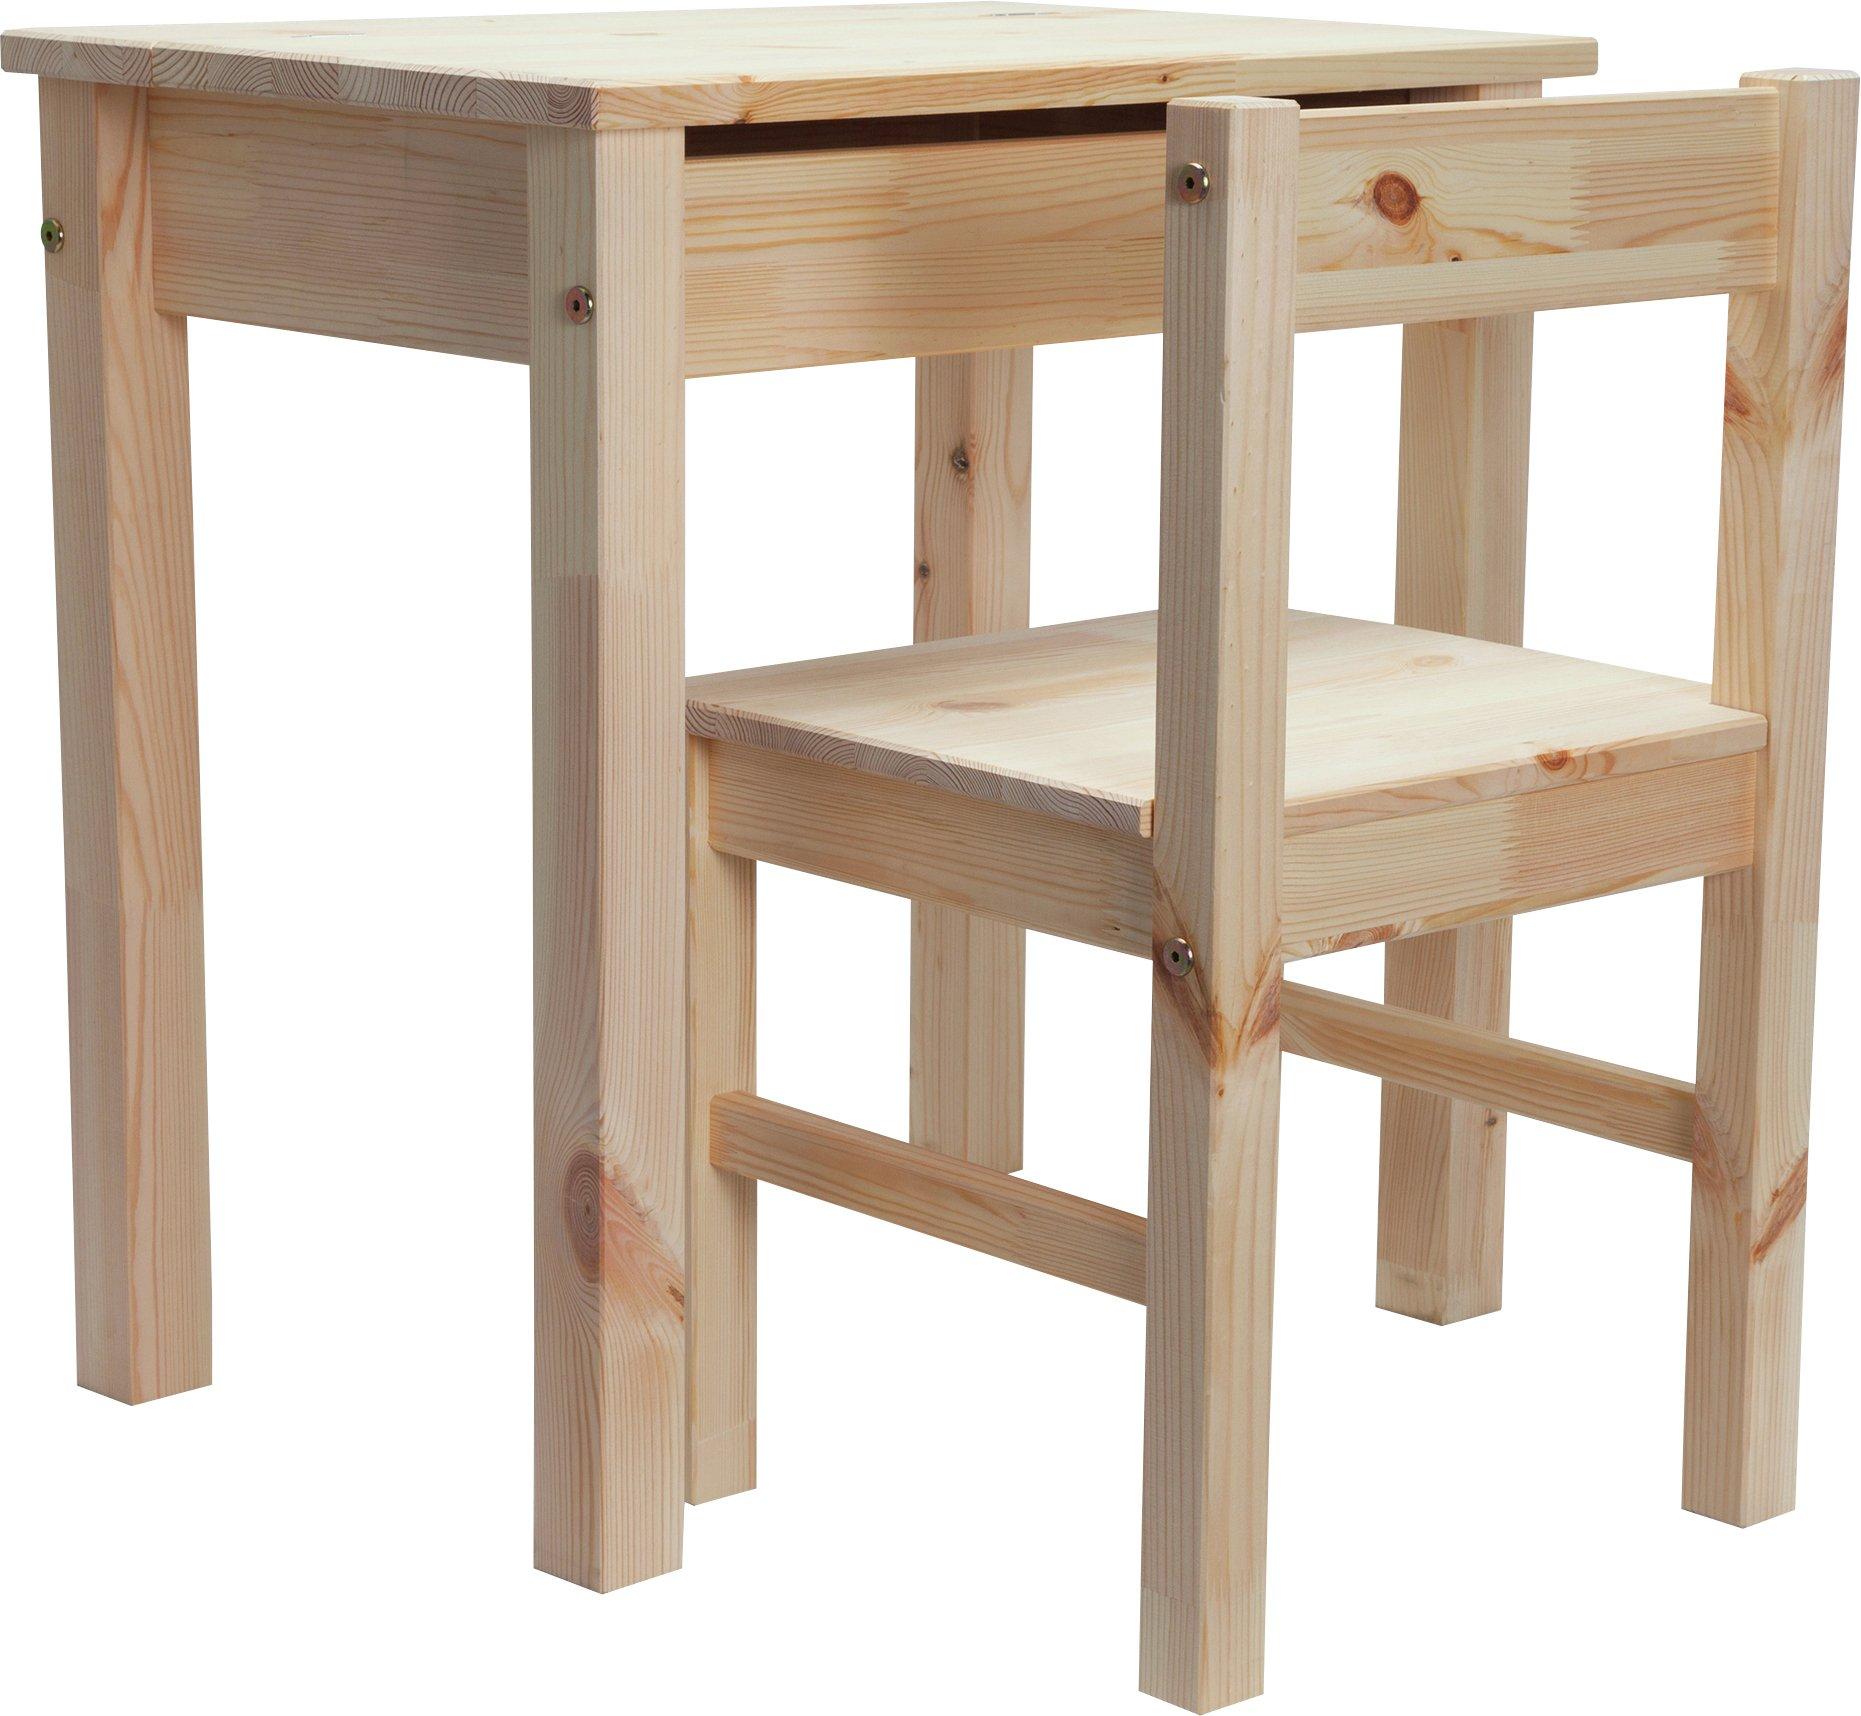 home-kids-scandinavia-desk-chair-pine